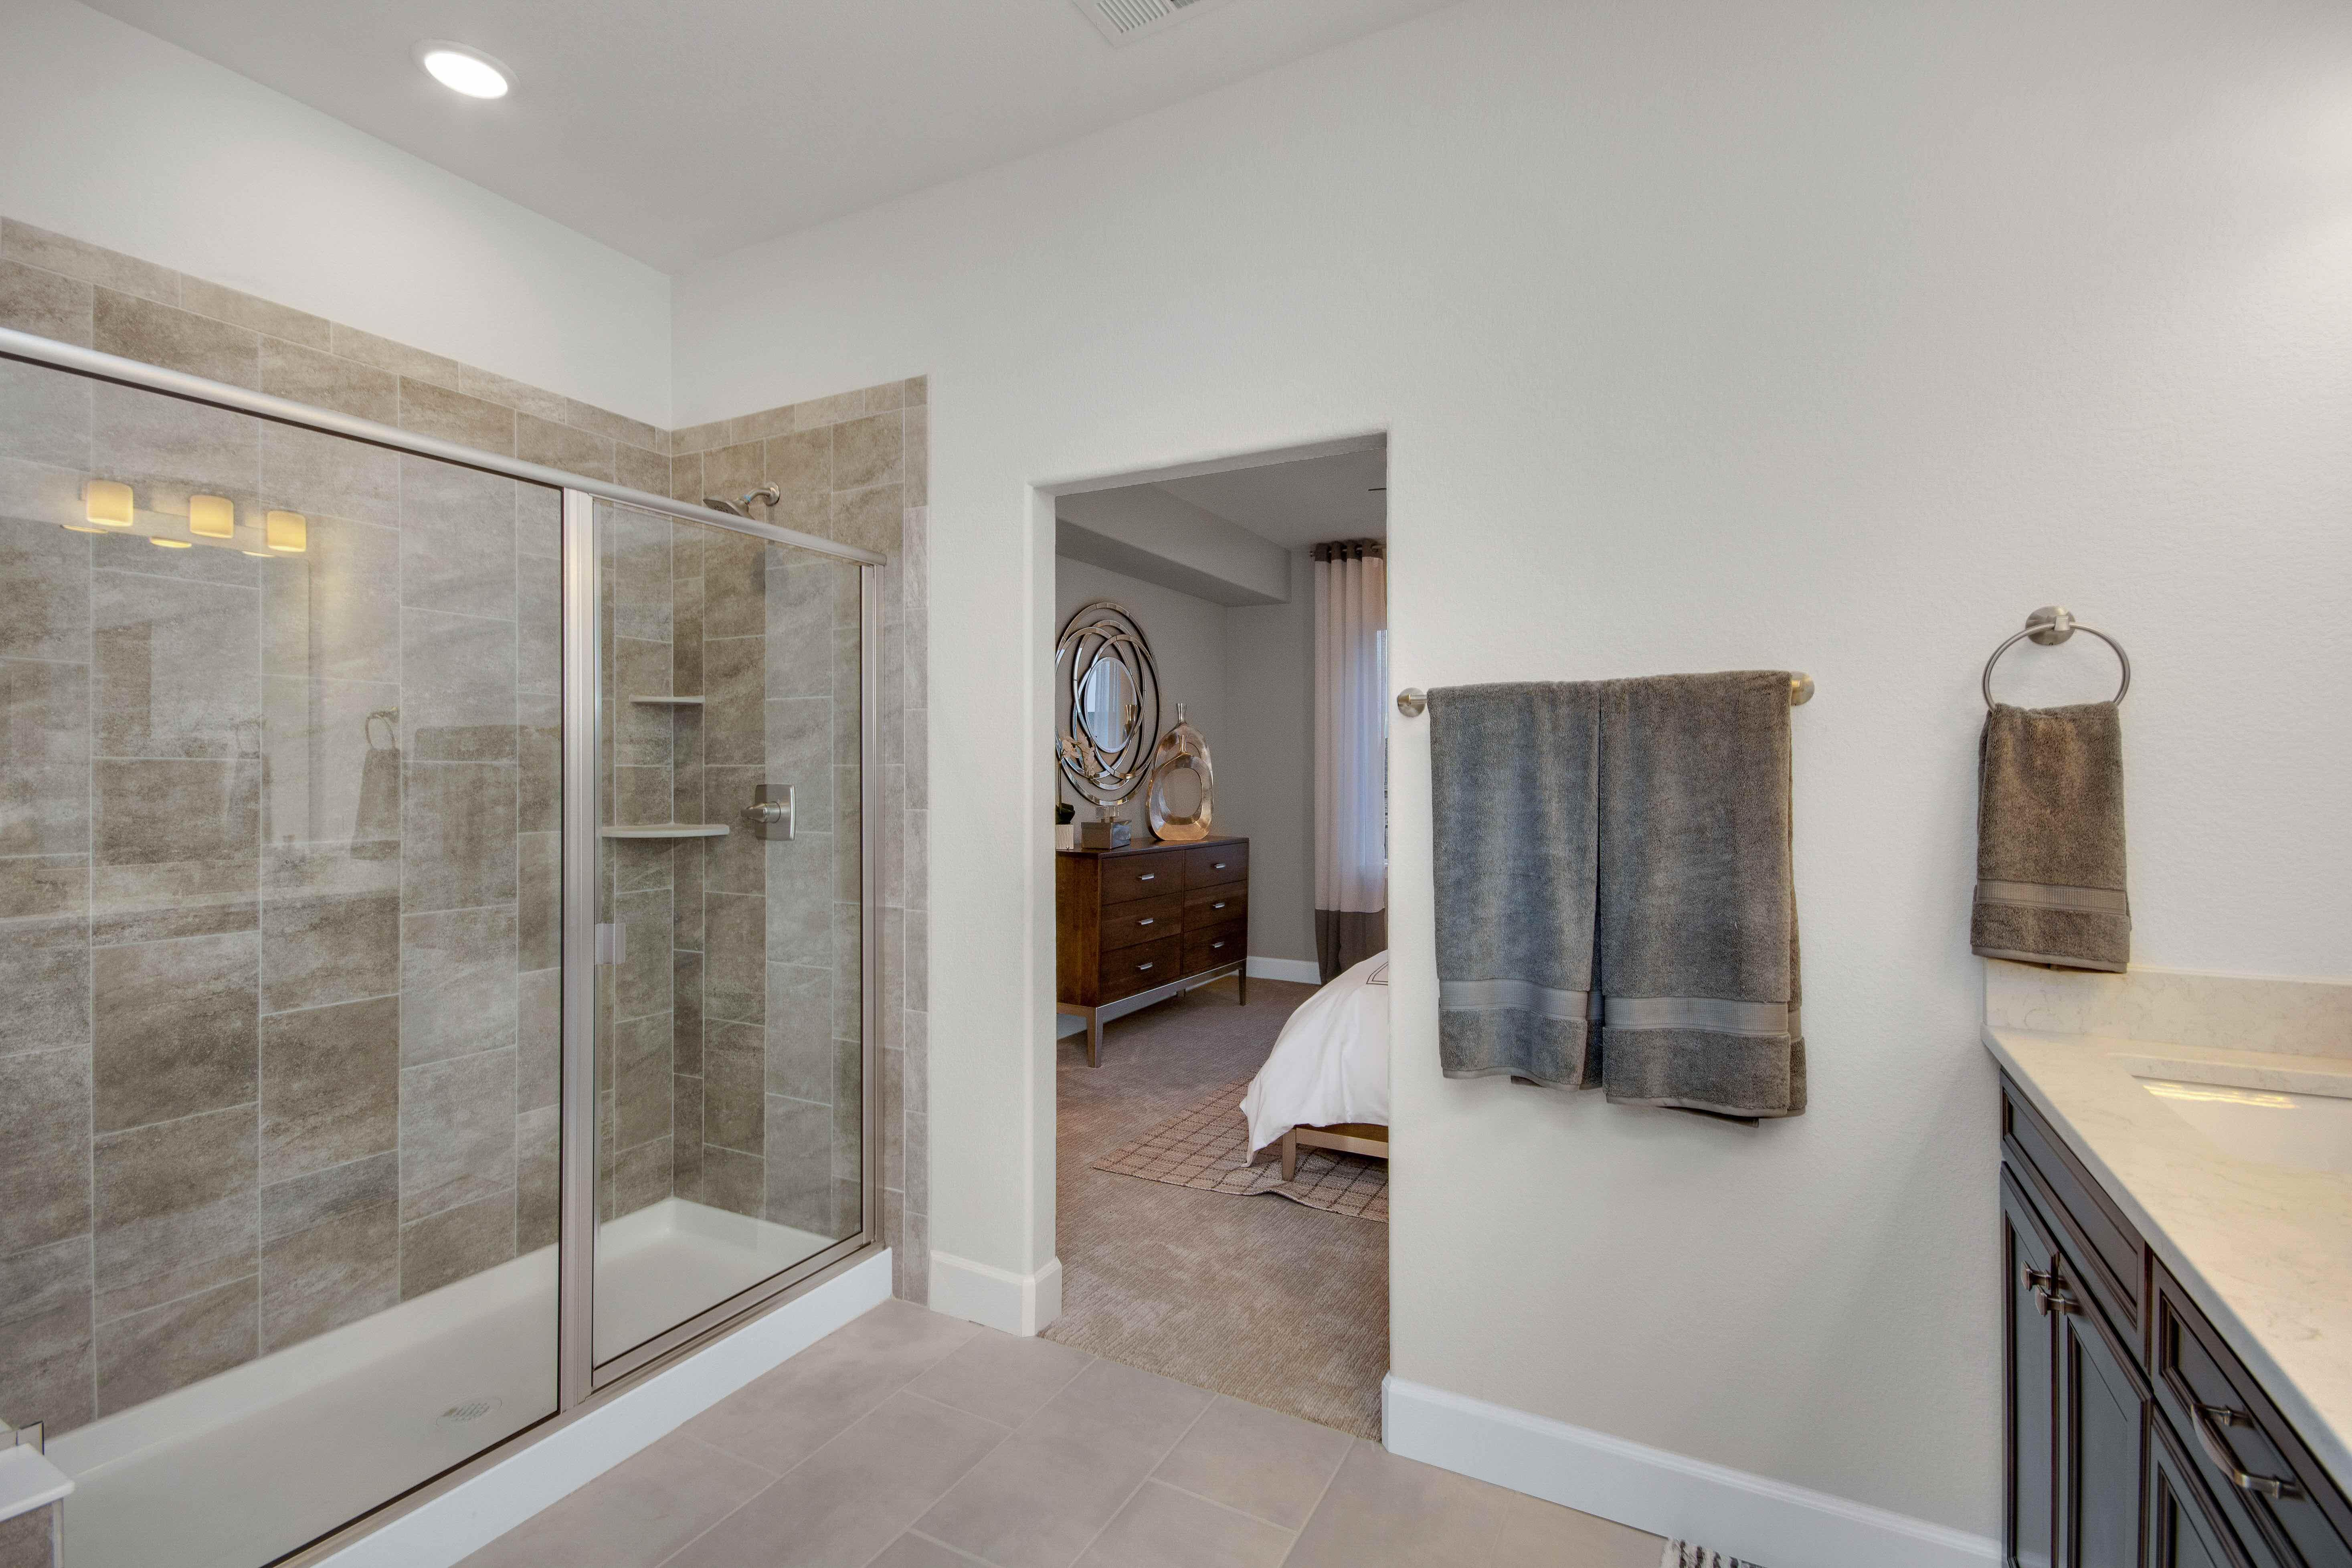 Bathroom featured in The Savannah By JM Weston Homes in Colorado Springs, CO